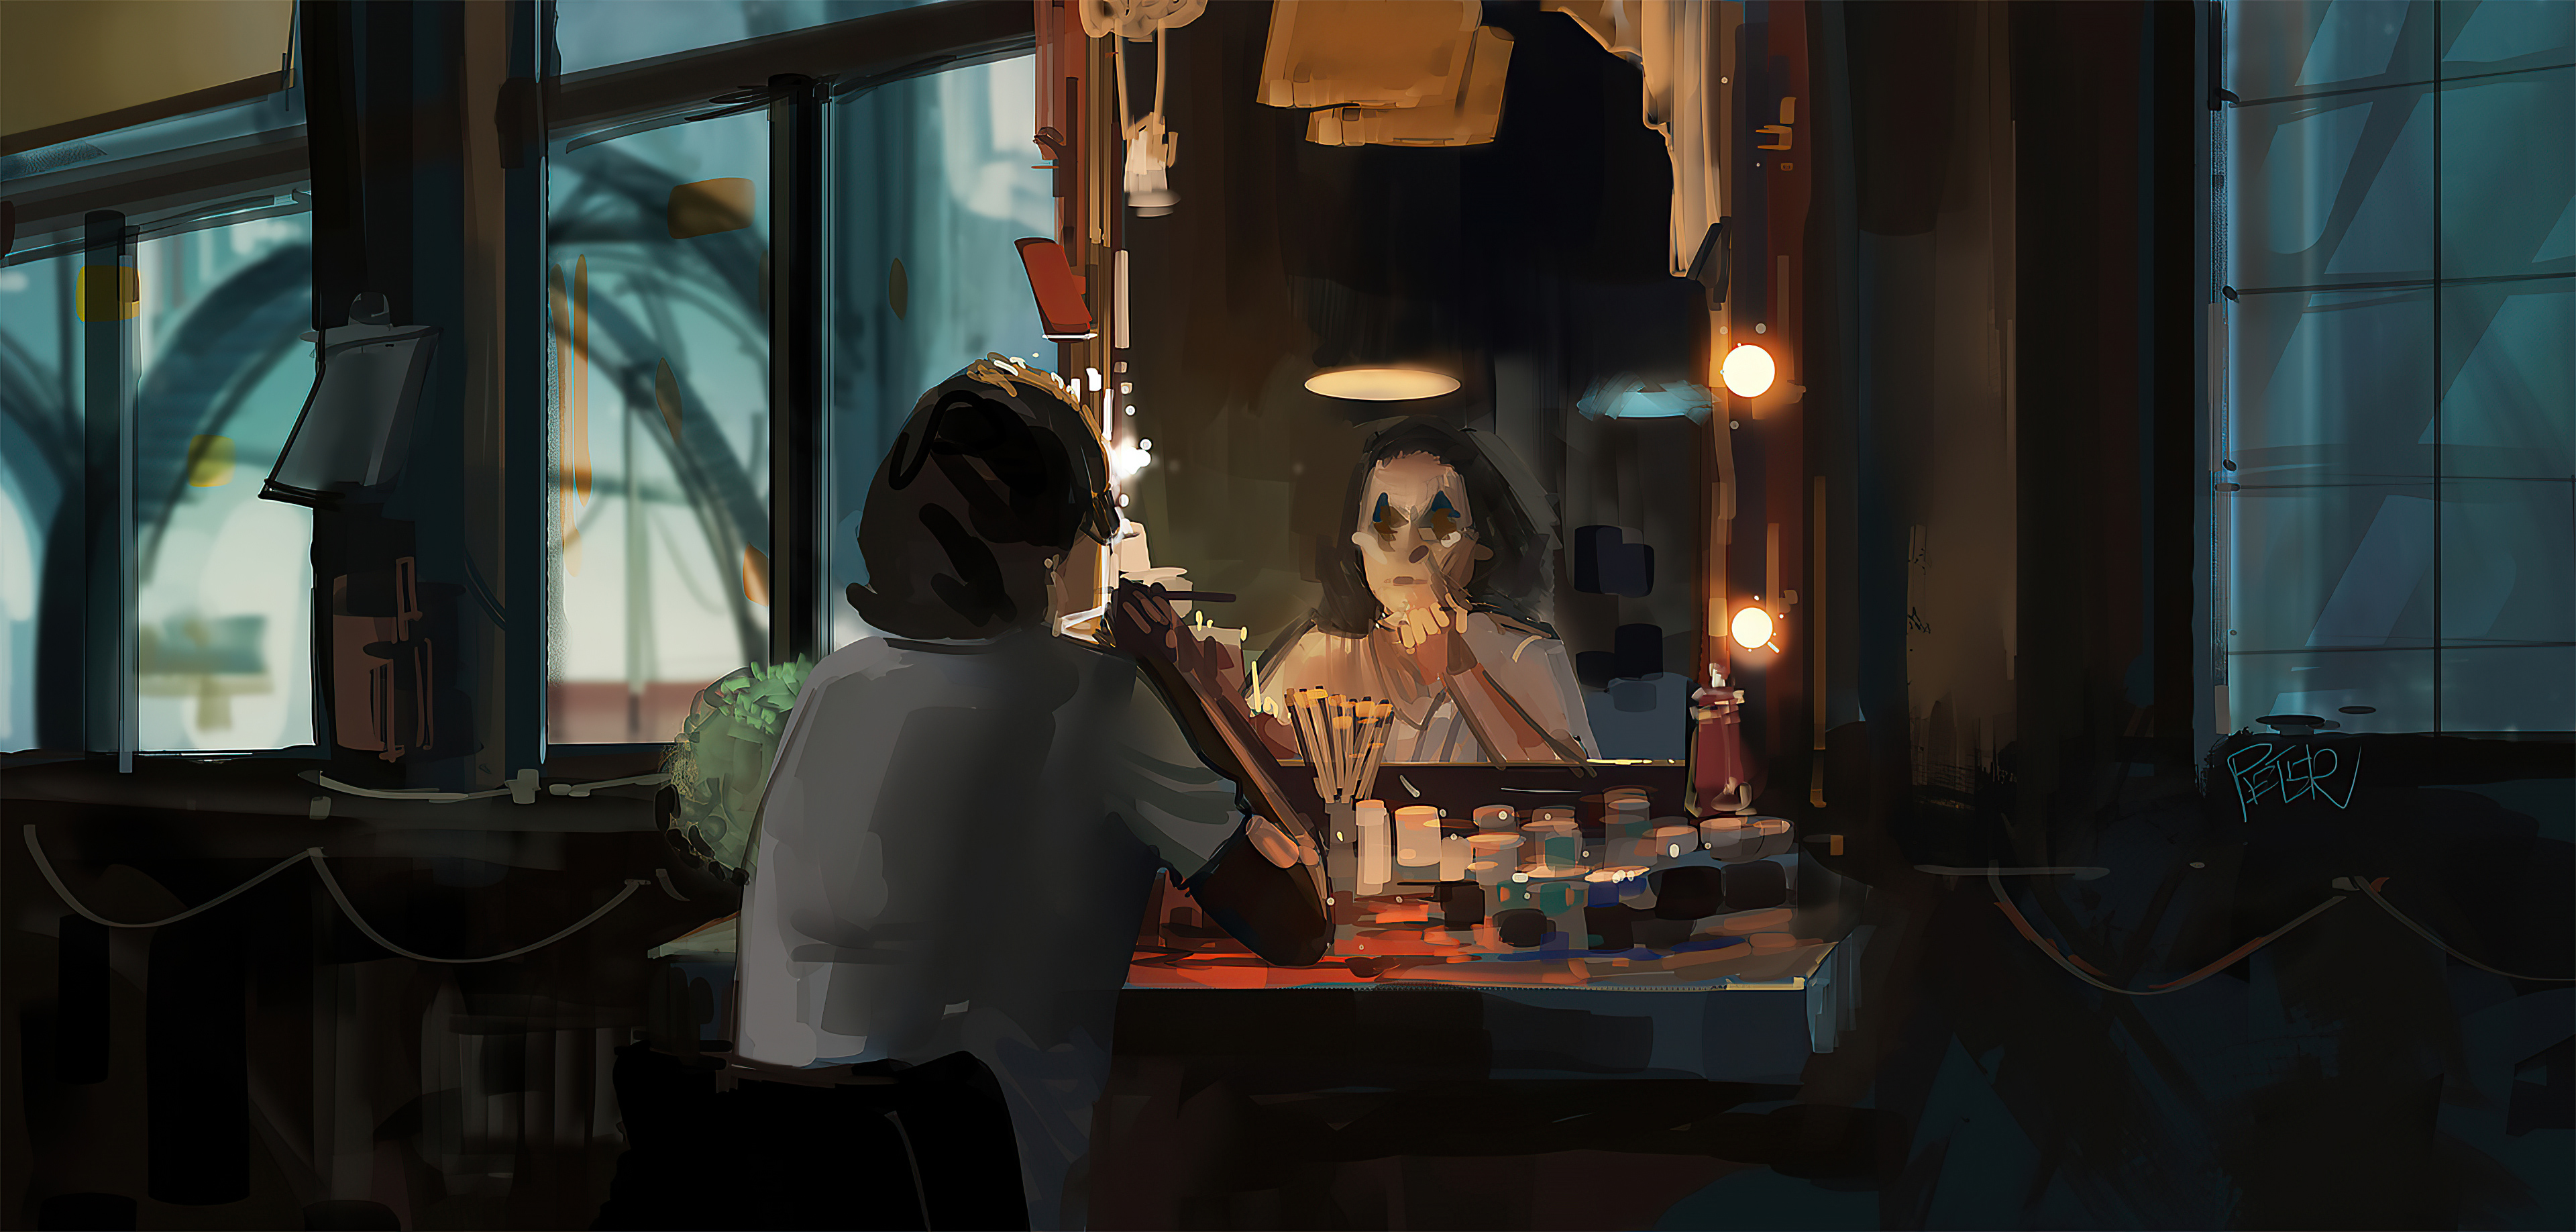 Fondos de pantalla El Guasón maquillandose Artwork